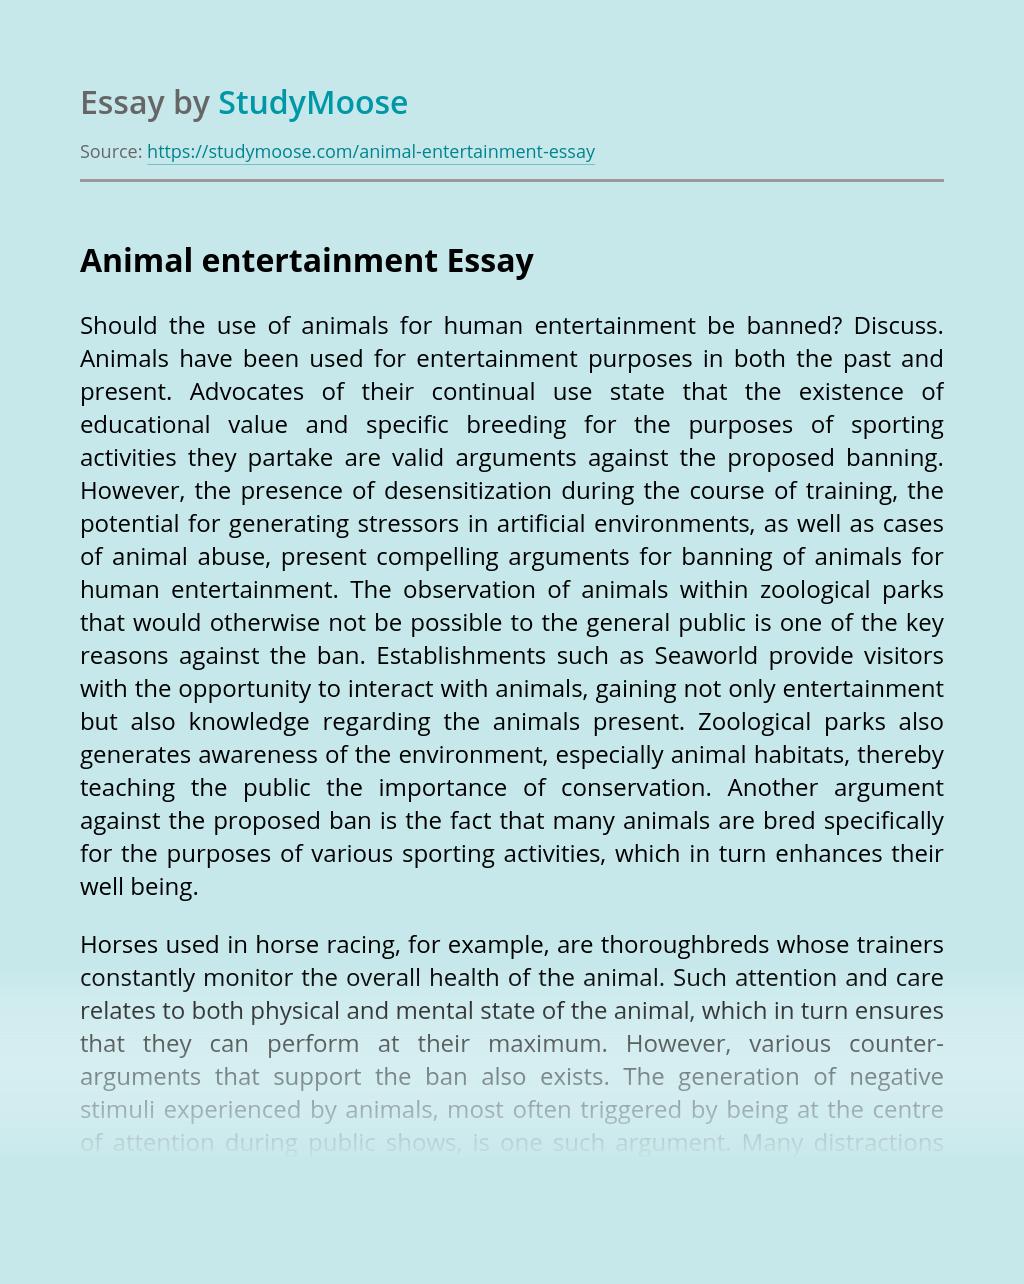 Animal entertainment